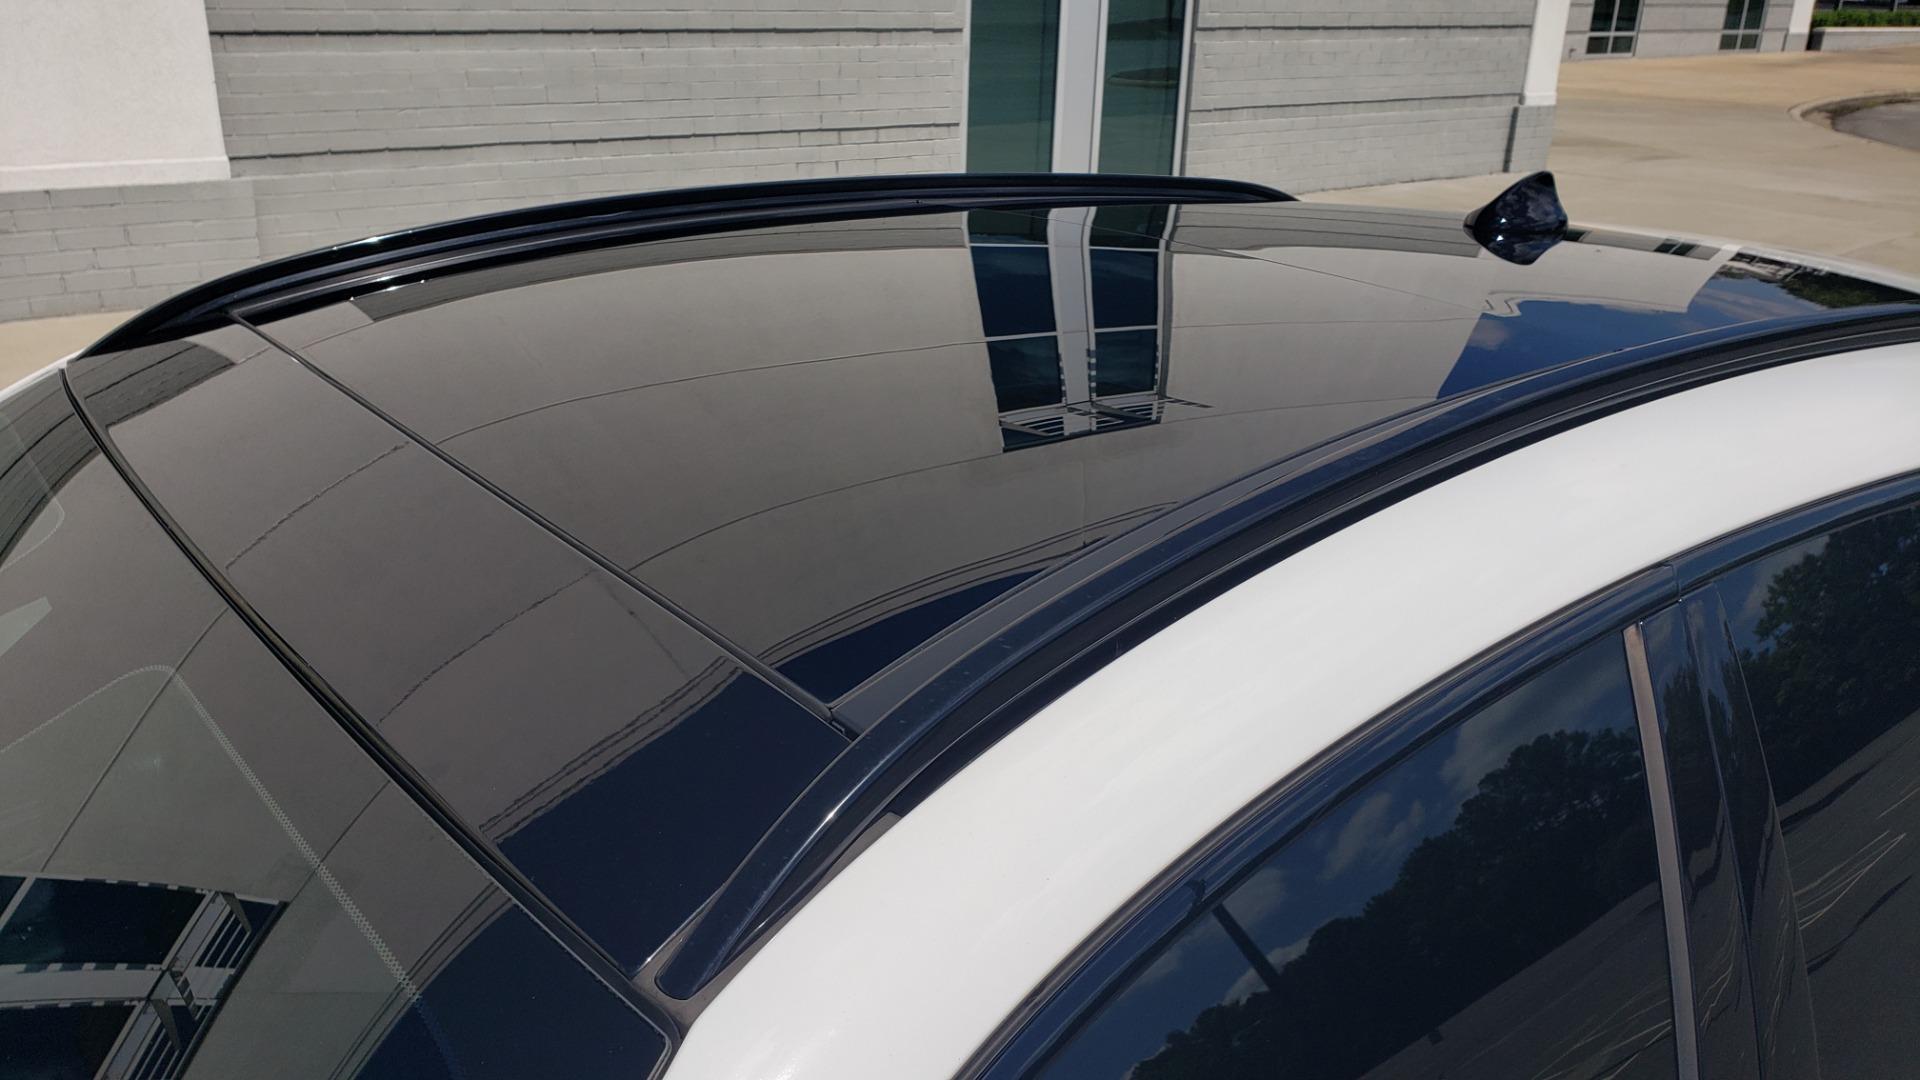 Used 2019 Alfa Romeo STELVIO TI SPORT AWD / 2.0L TURBO / 8-SPD AUTO / DRVR ASST / REARVIEW for sale $37,495 at Formula Imports in Charlotte NC 28227 13